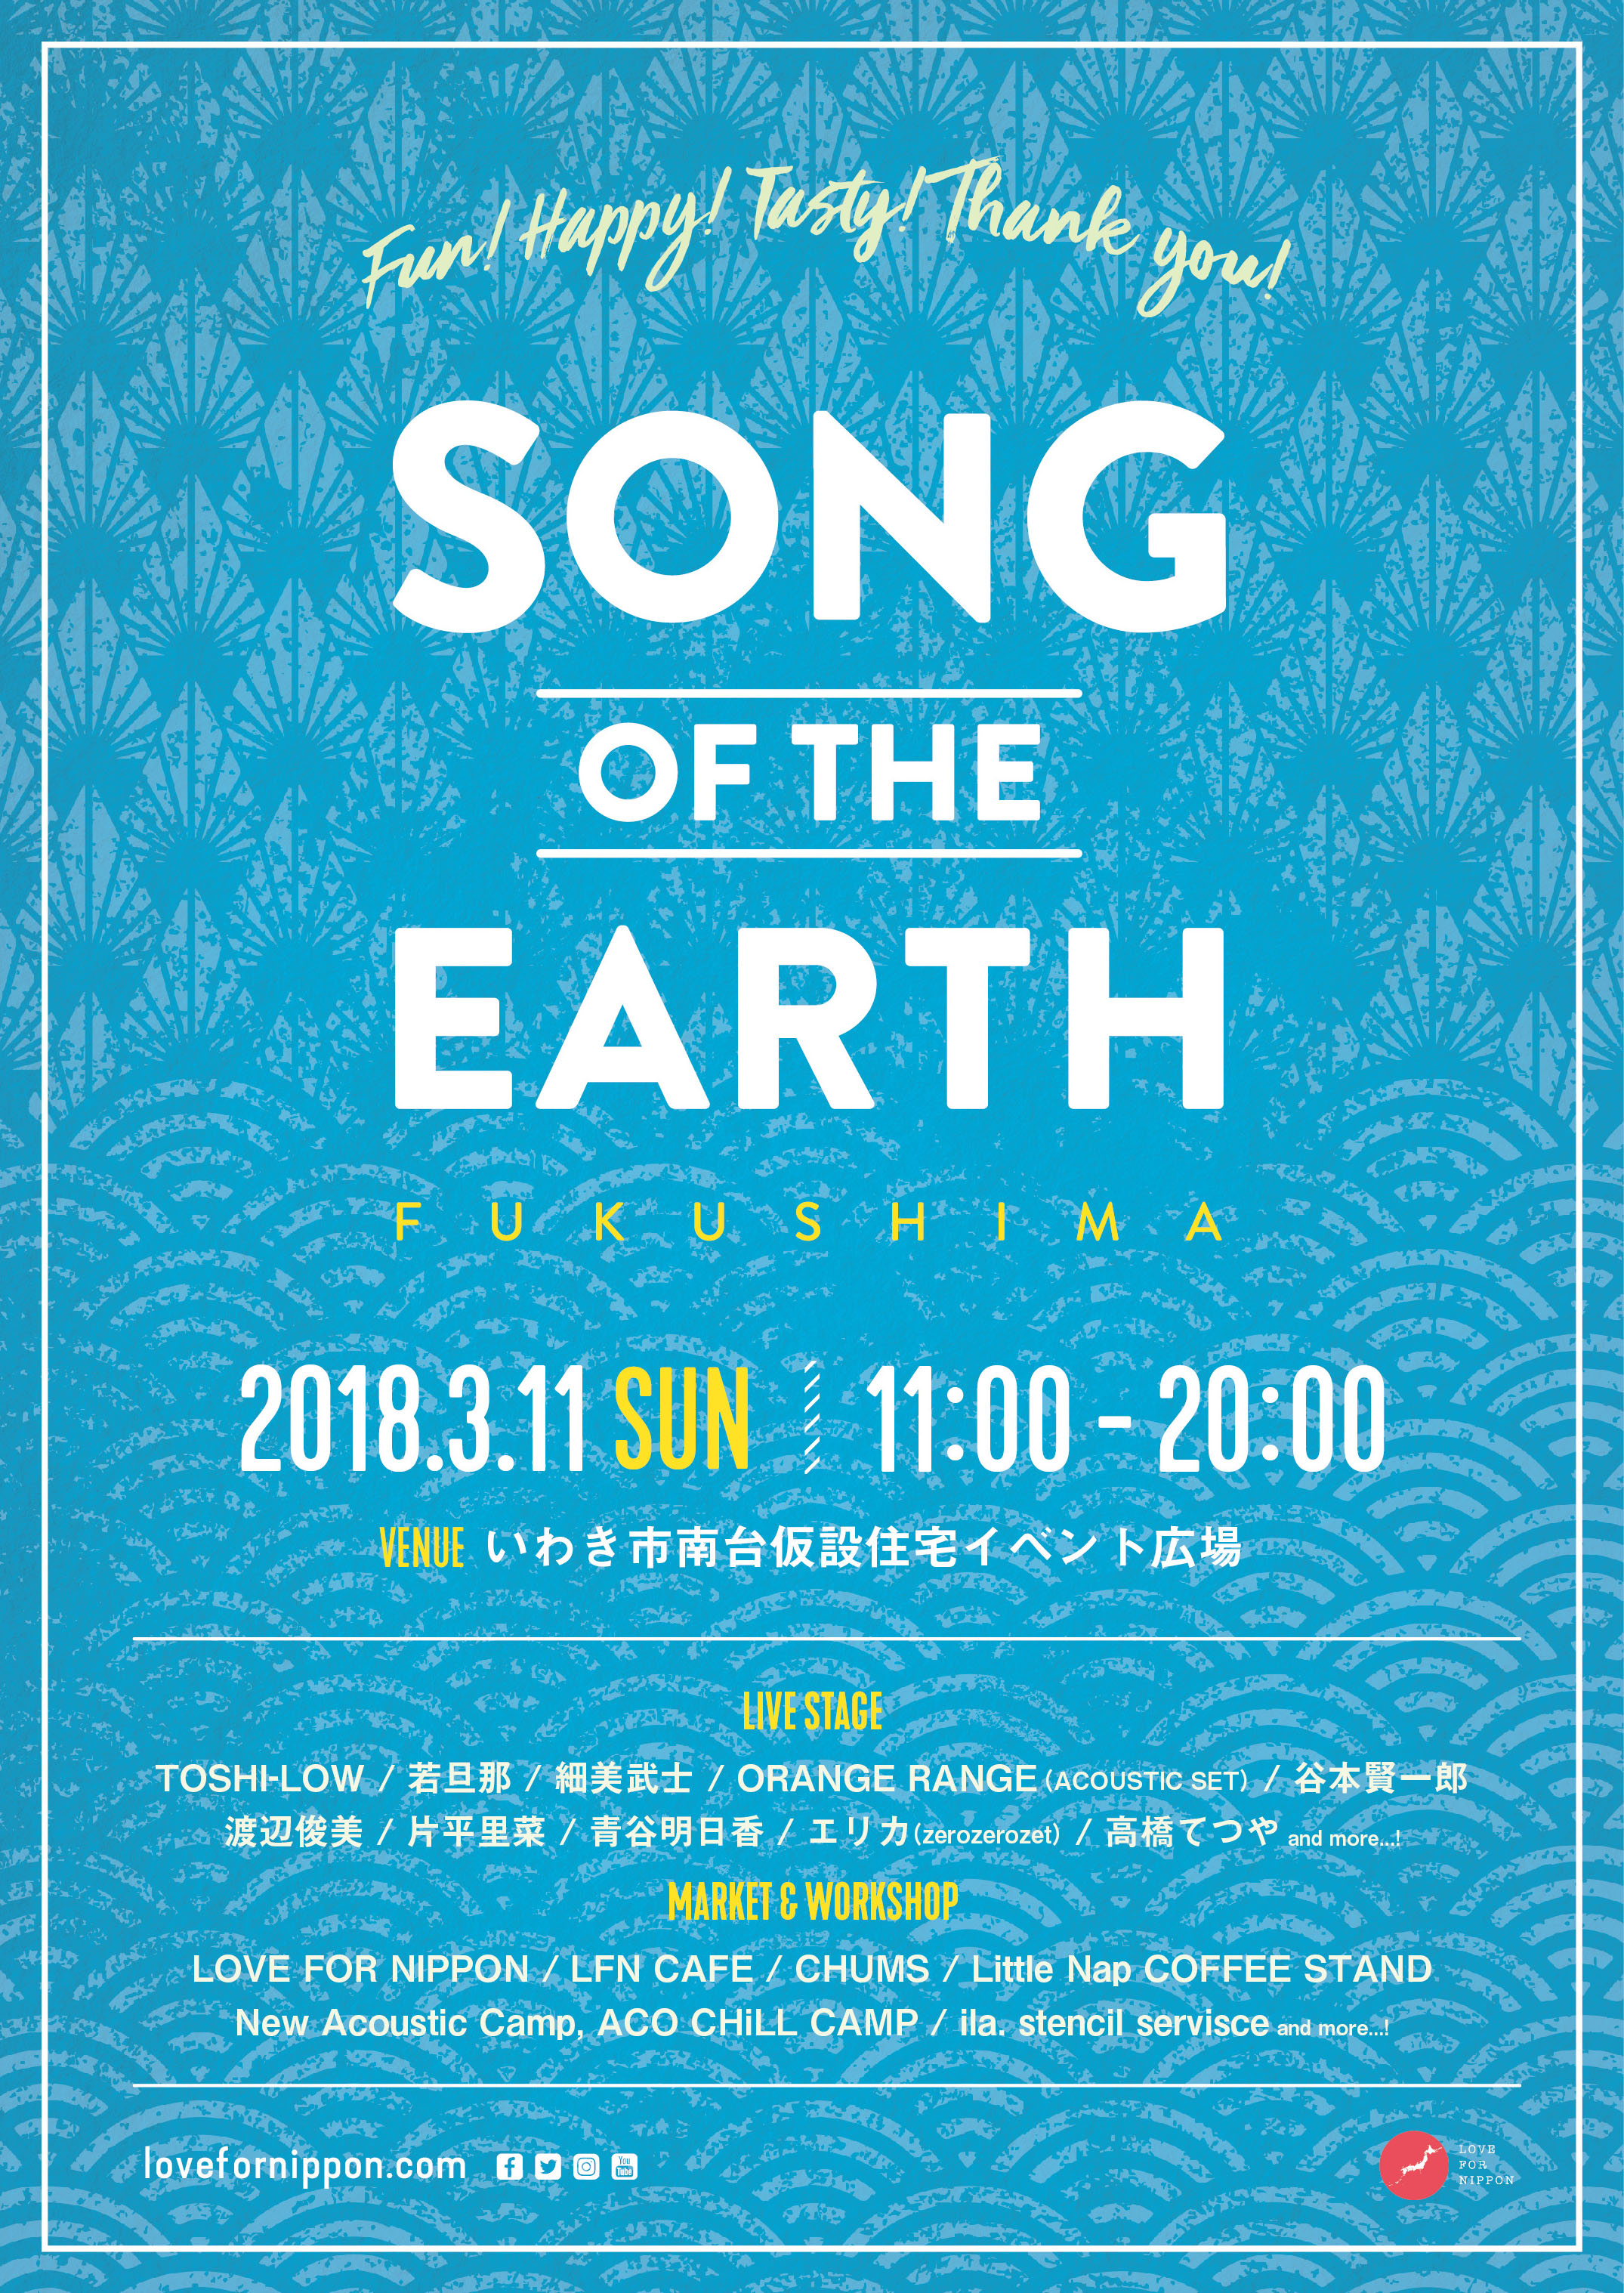 SONG OF THE EARTH FUKUSHIMA -CANDLE11th- 開催決定!